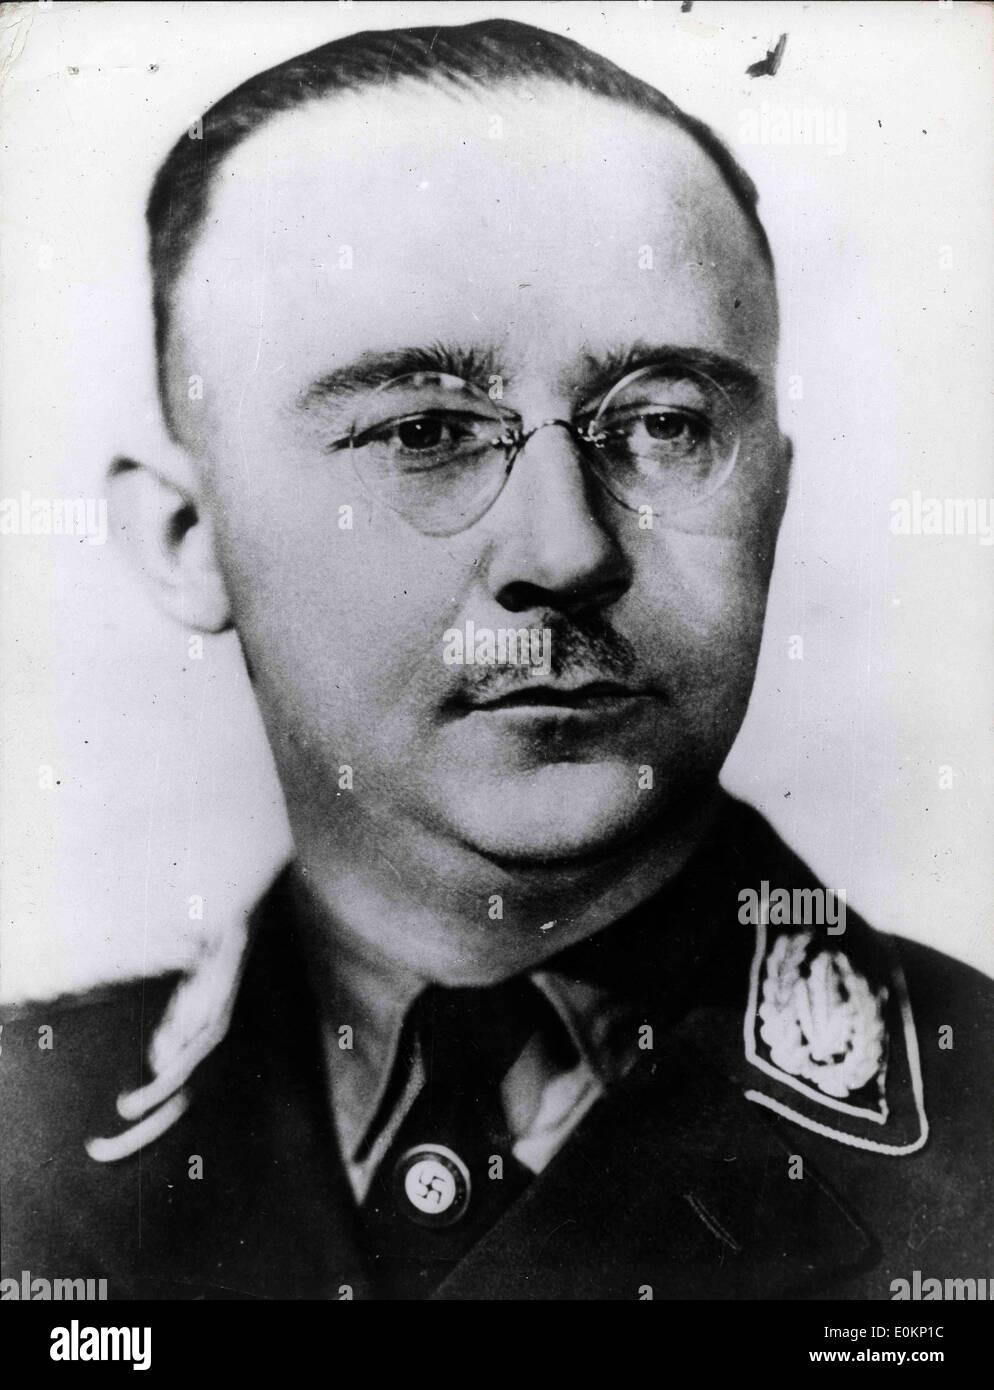 Portrait of Nazi commander Heinrich Himmler - Stock Image